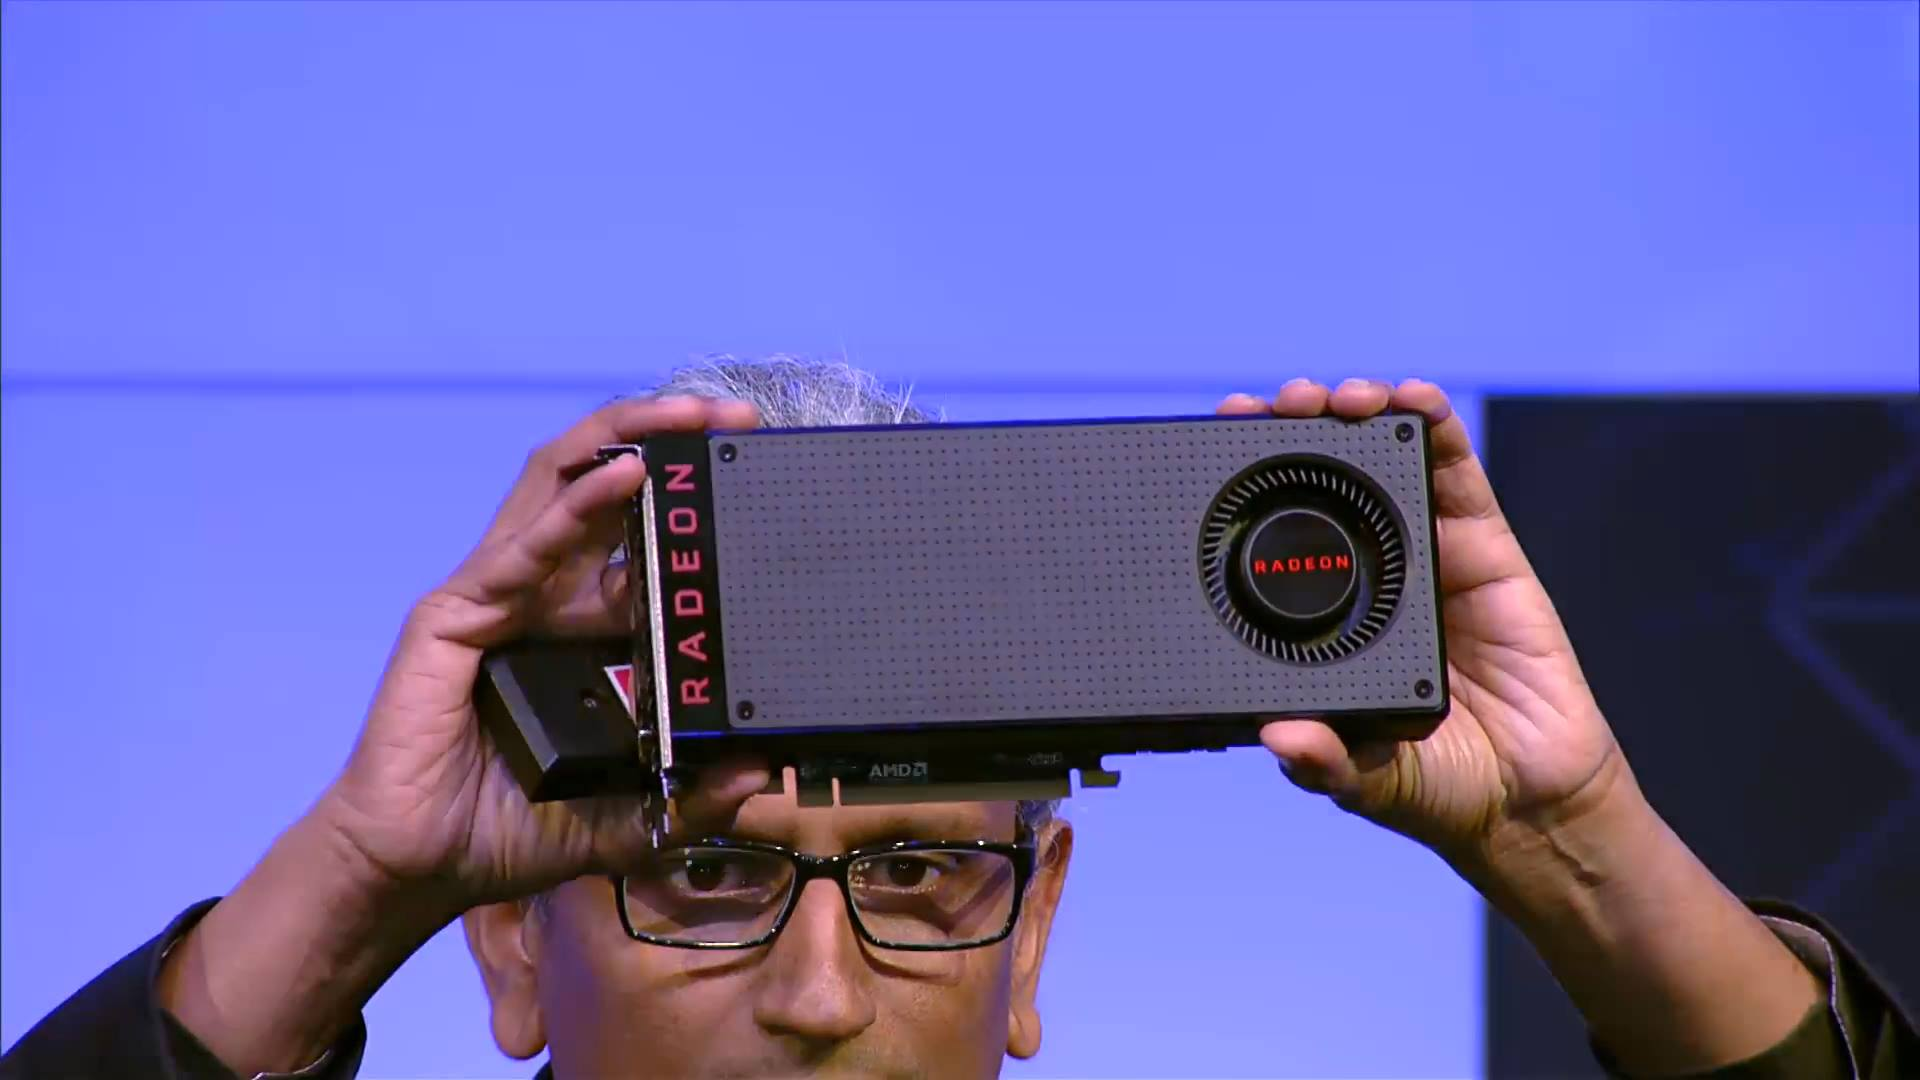 AMD-Radeon-RX-480-Graphic-Card